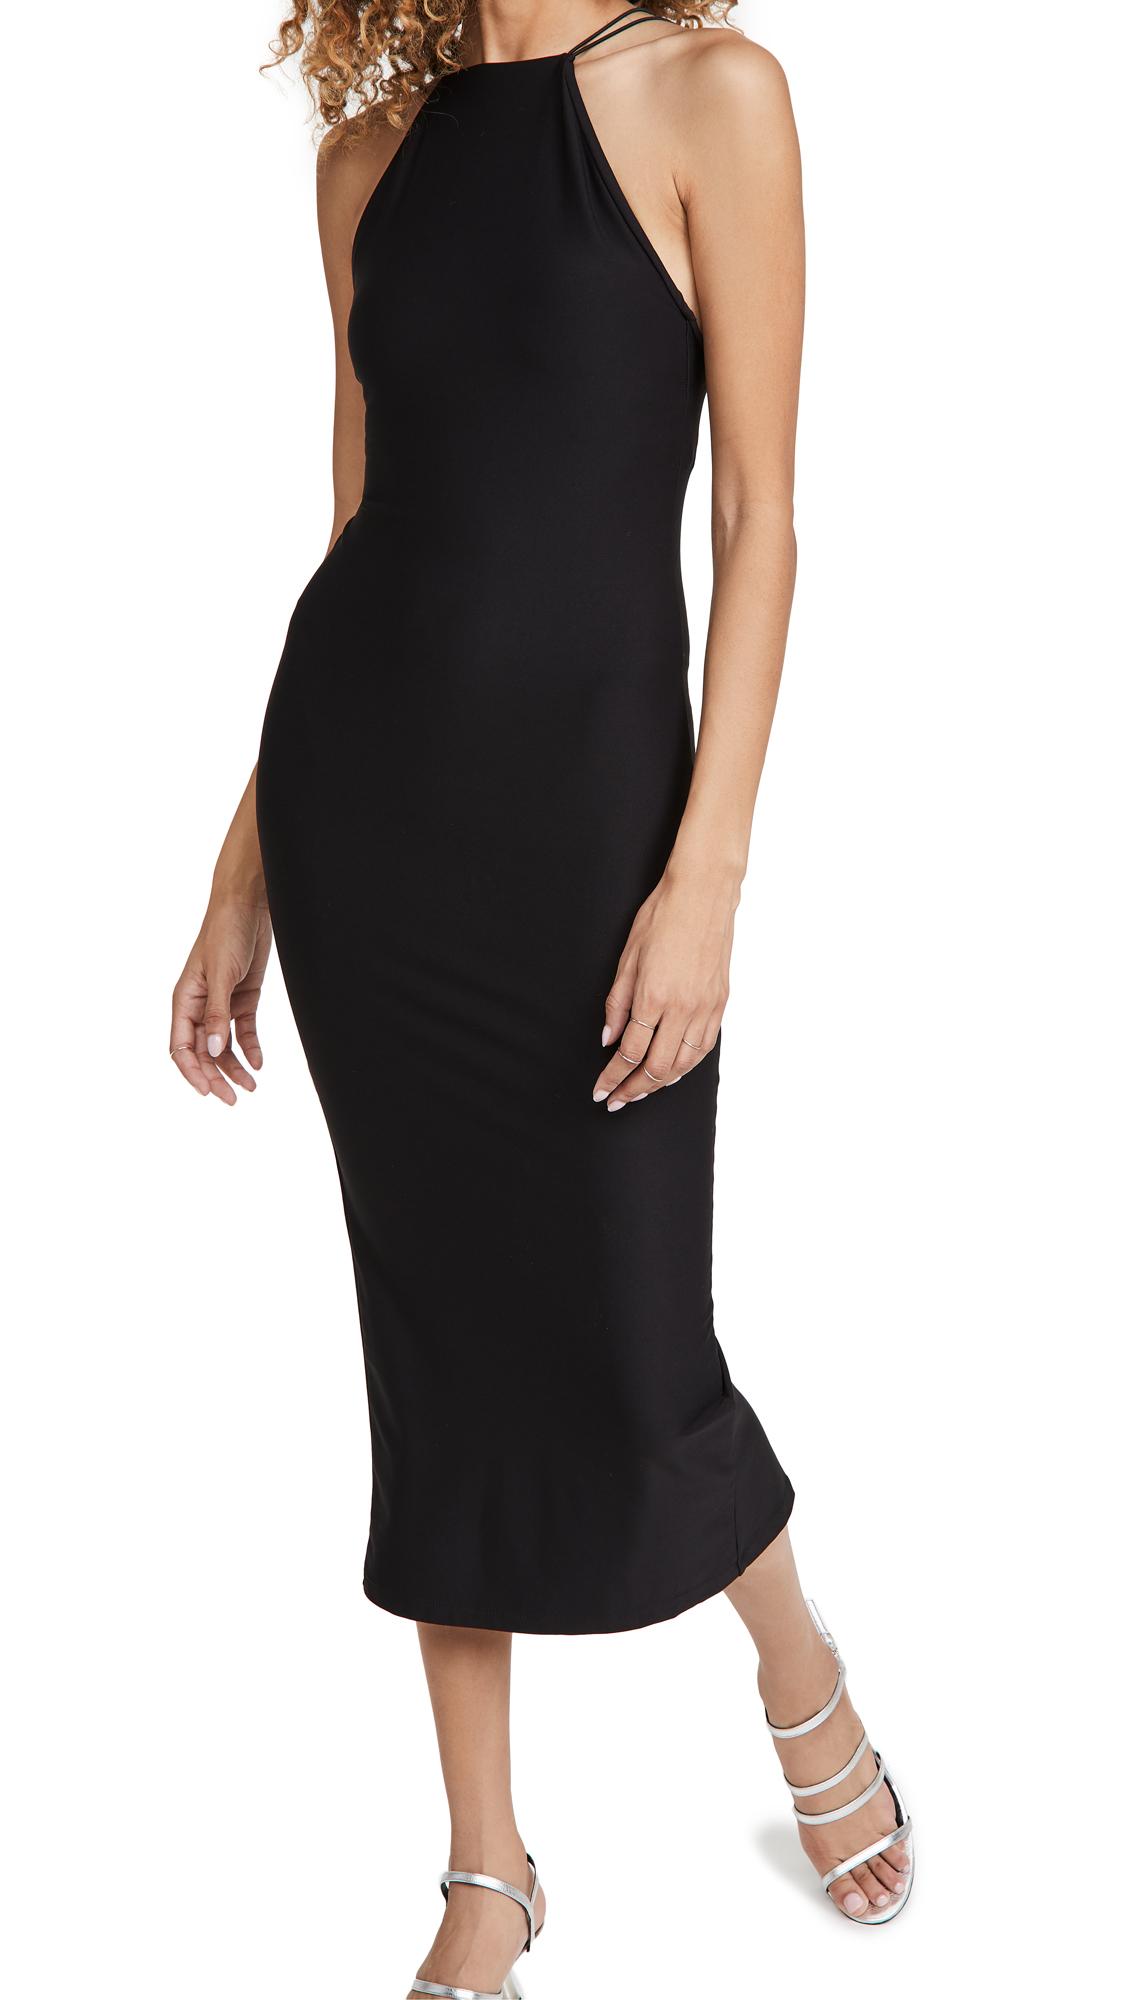 Alix Shiloh Dress